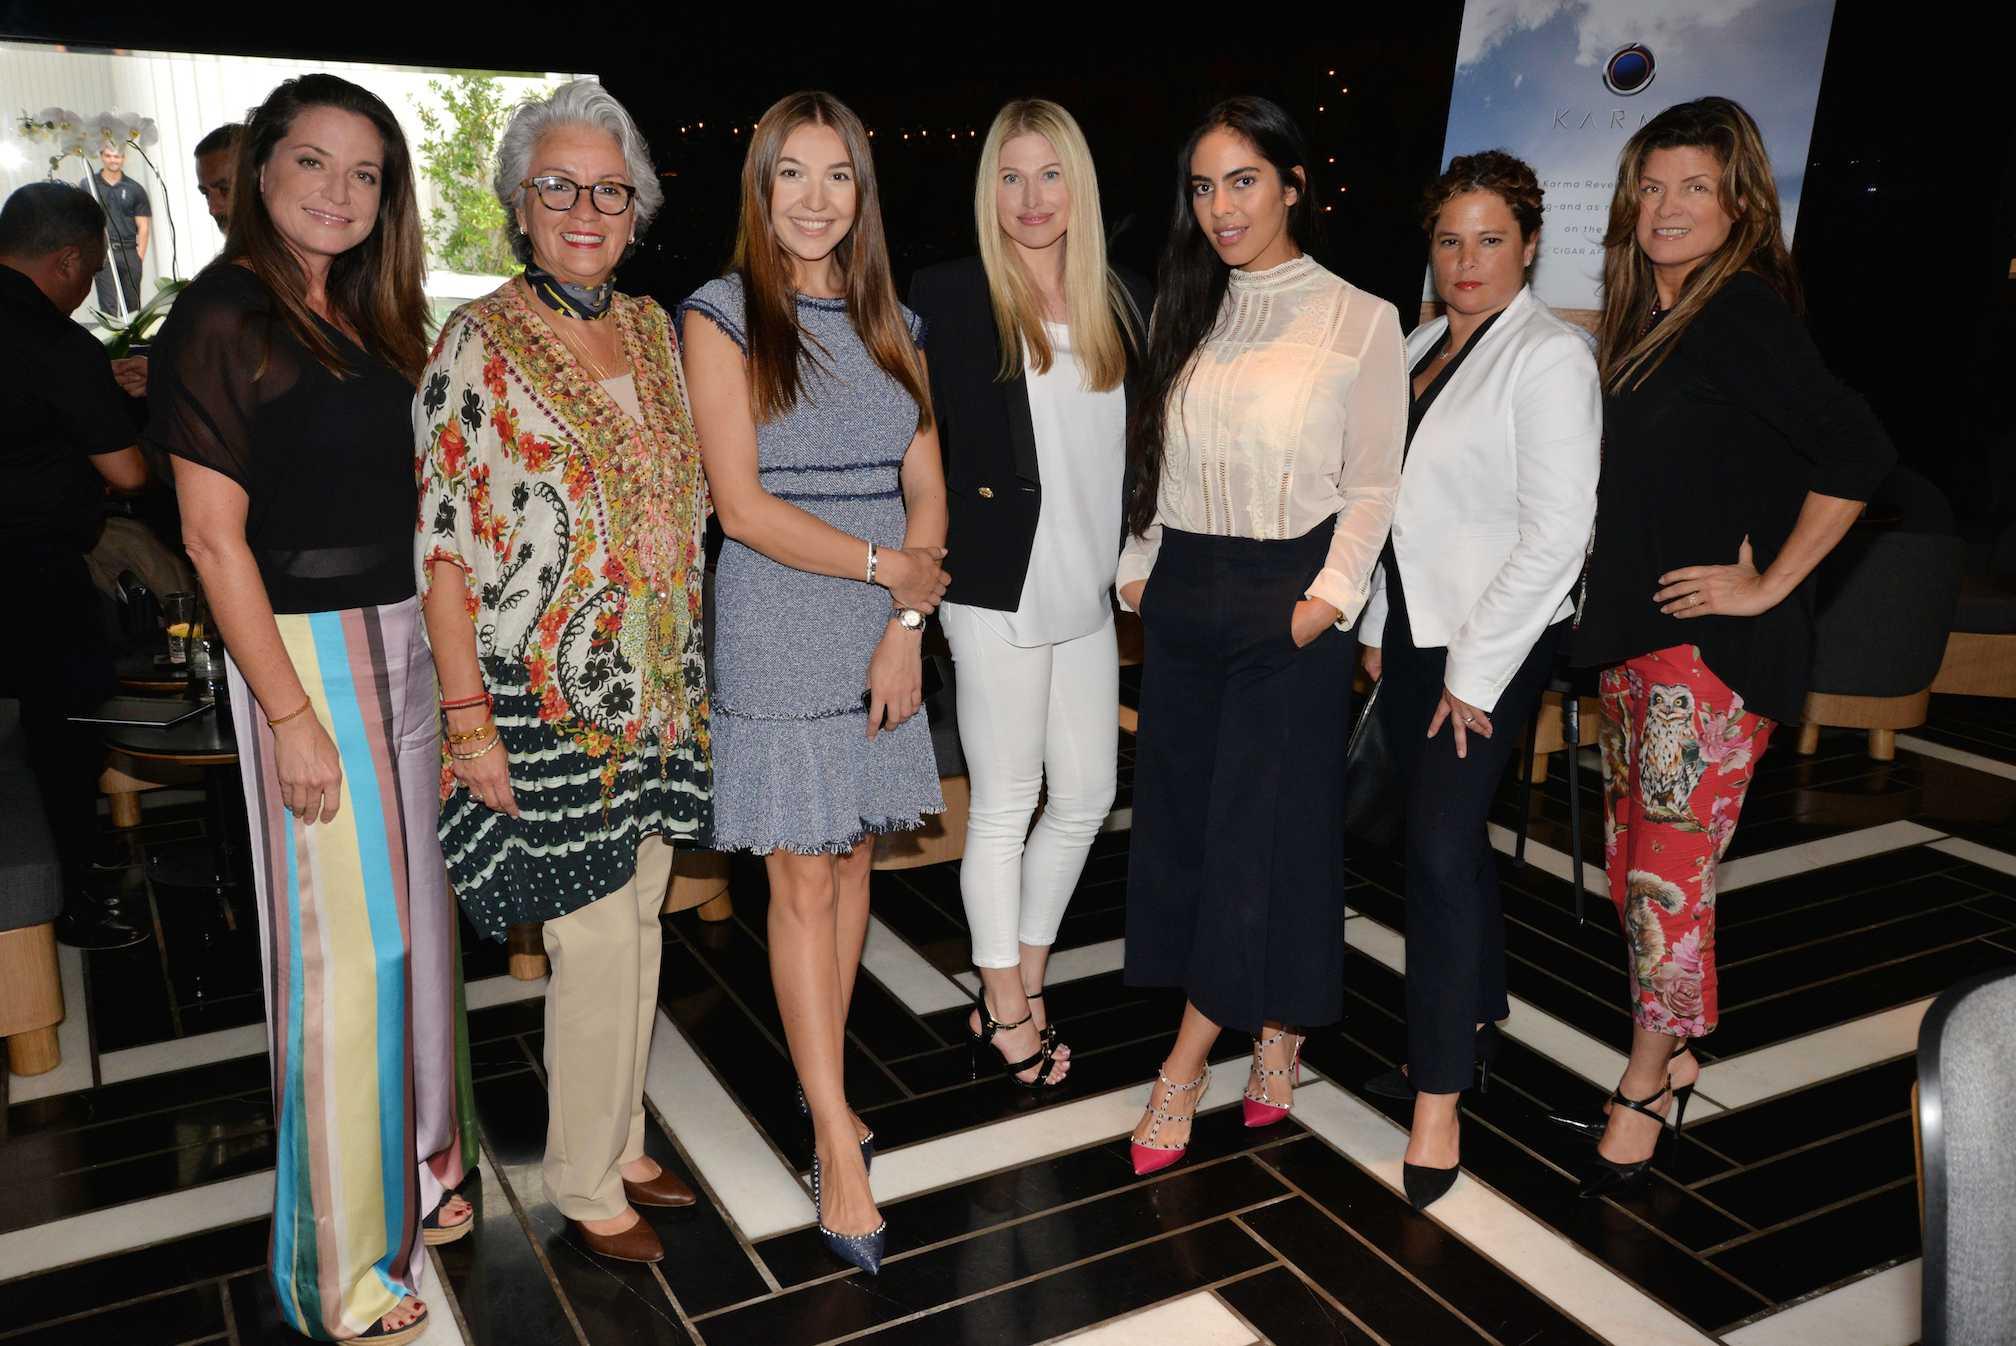 Katie Lillis, Adriana Pinto Torres, Dasha Goncharova, Dina Goldenteyer, Deyvanshi Masrani, ___ and Dora Puig